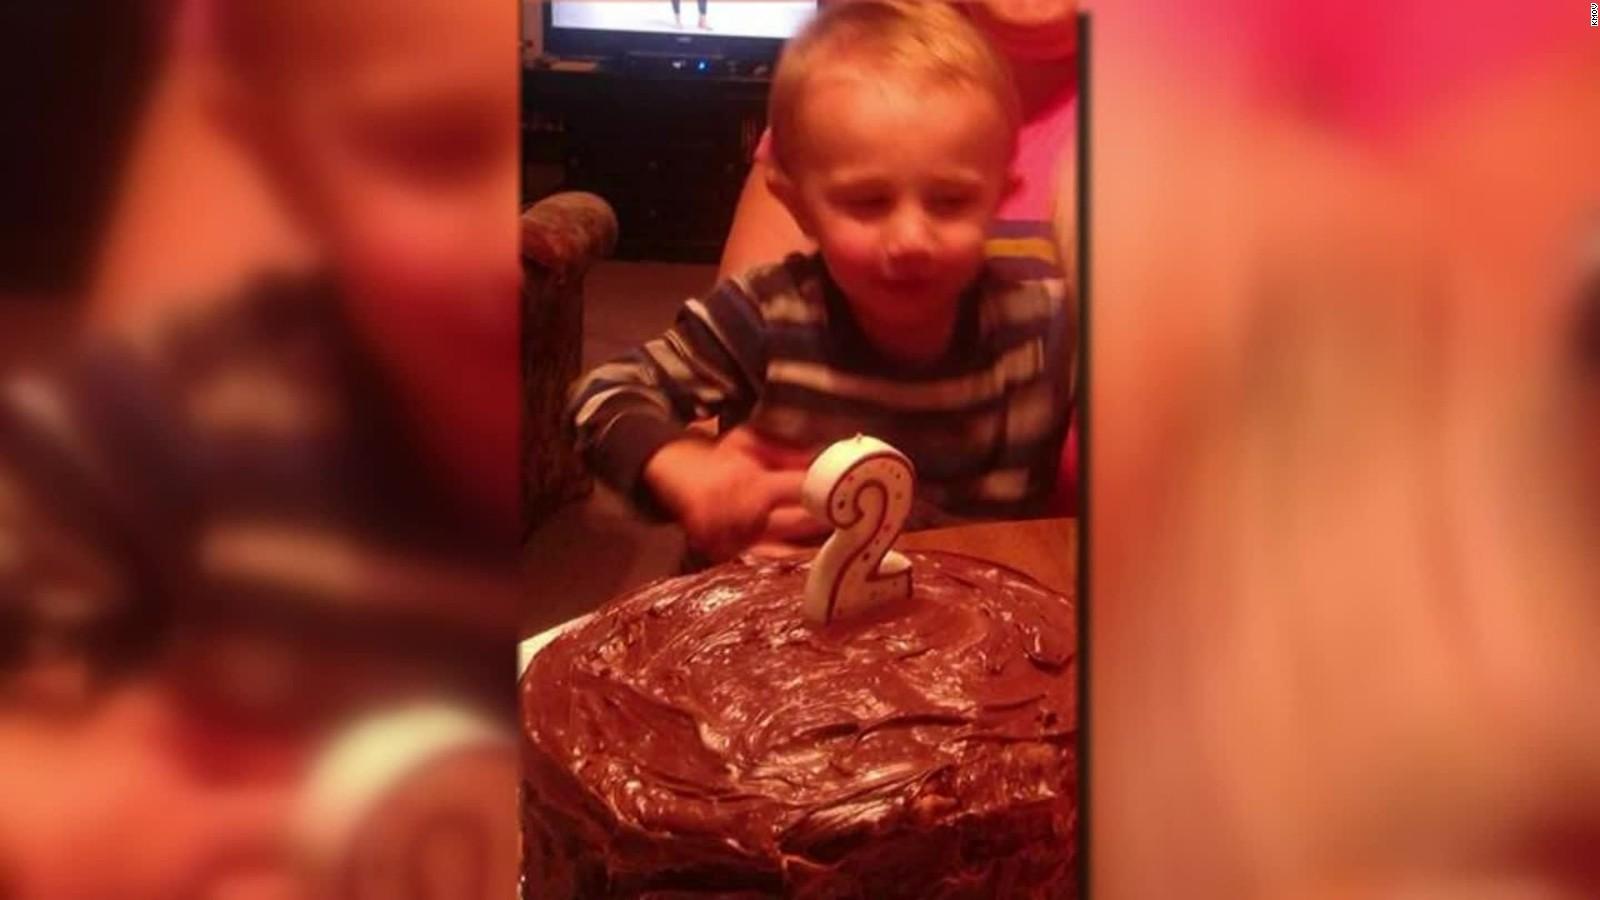 Neglected boy shut in room with heater on dies CNN